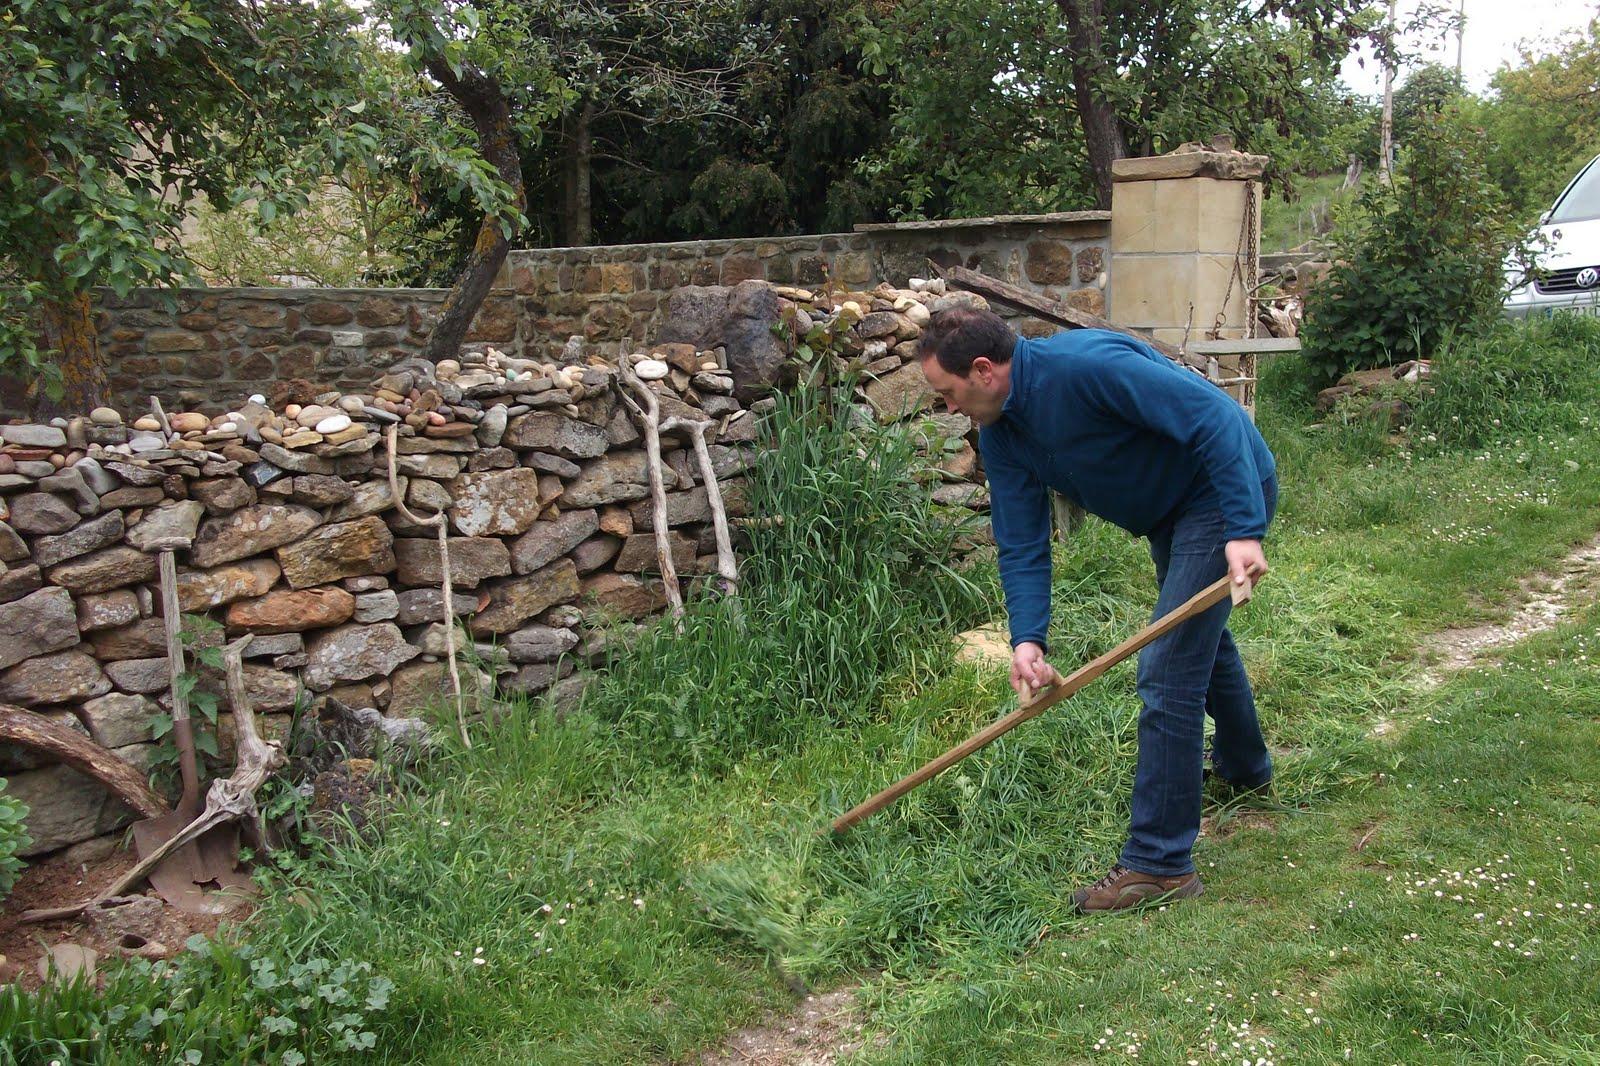 Rueda la bota mayo 2011 - Cortar hierba alta ...